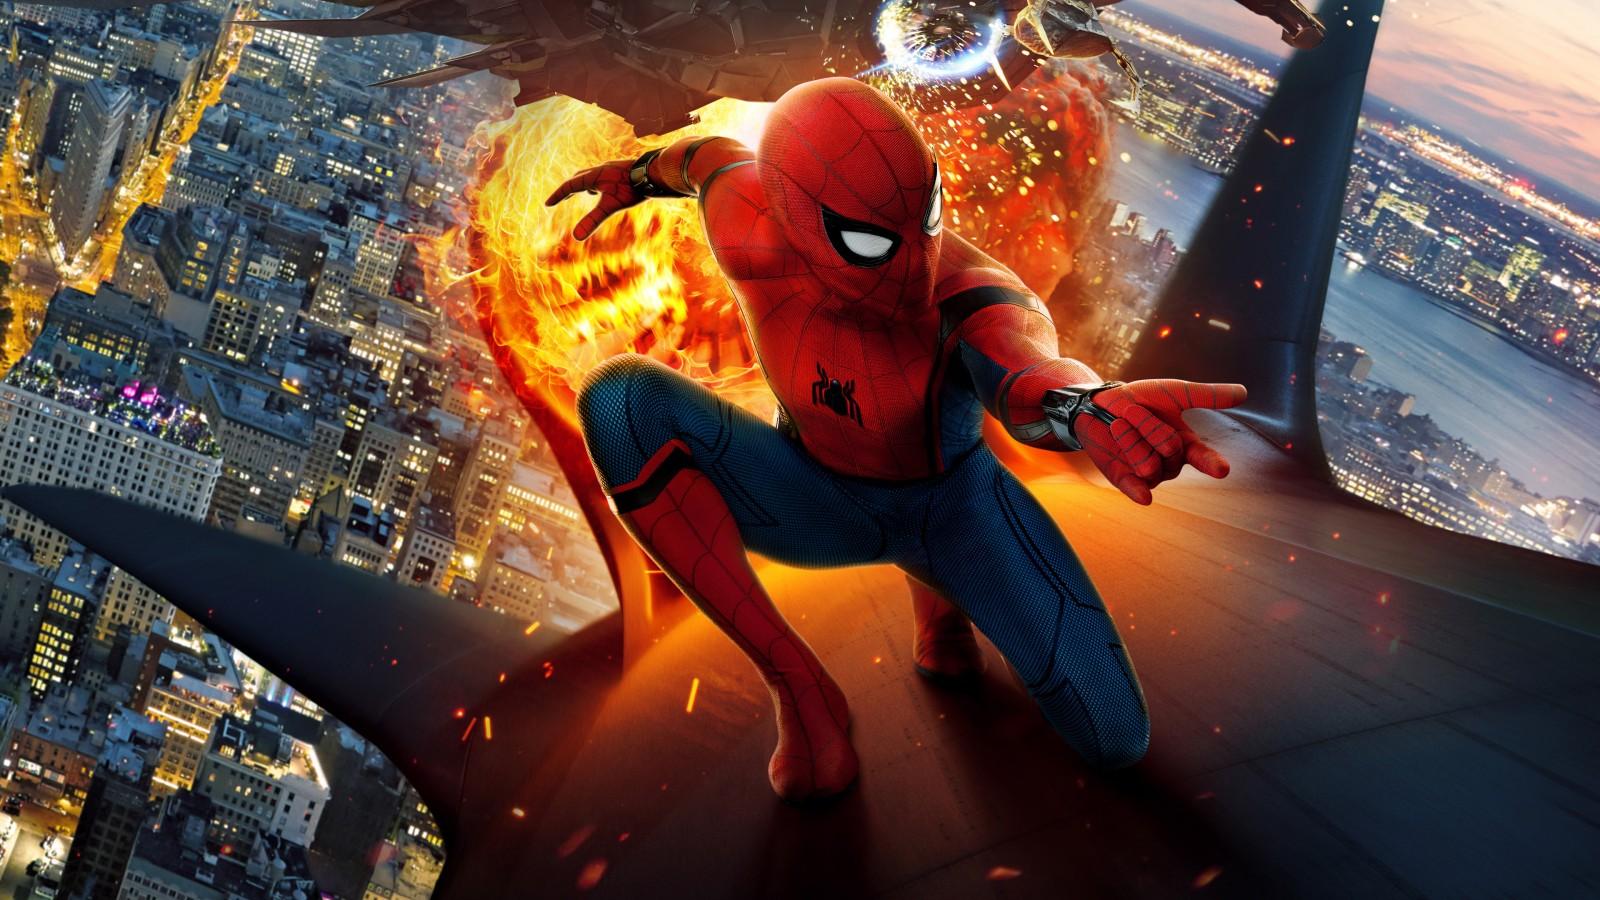 3d Desktop Wallpaper For Windows 7 Spider Man Homecoming 4k Hd Wallpapers Hd Wallpapers